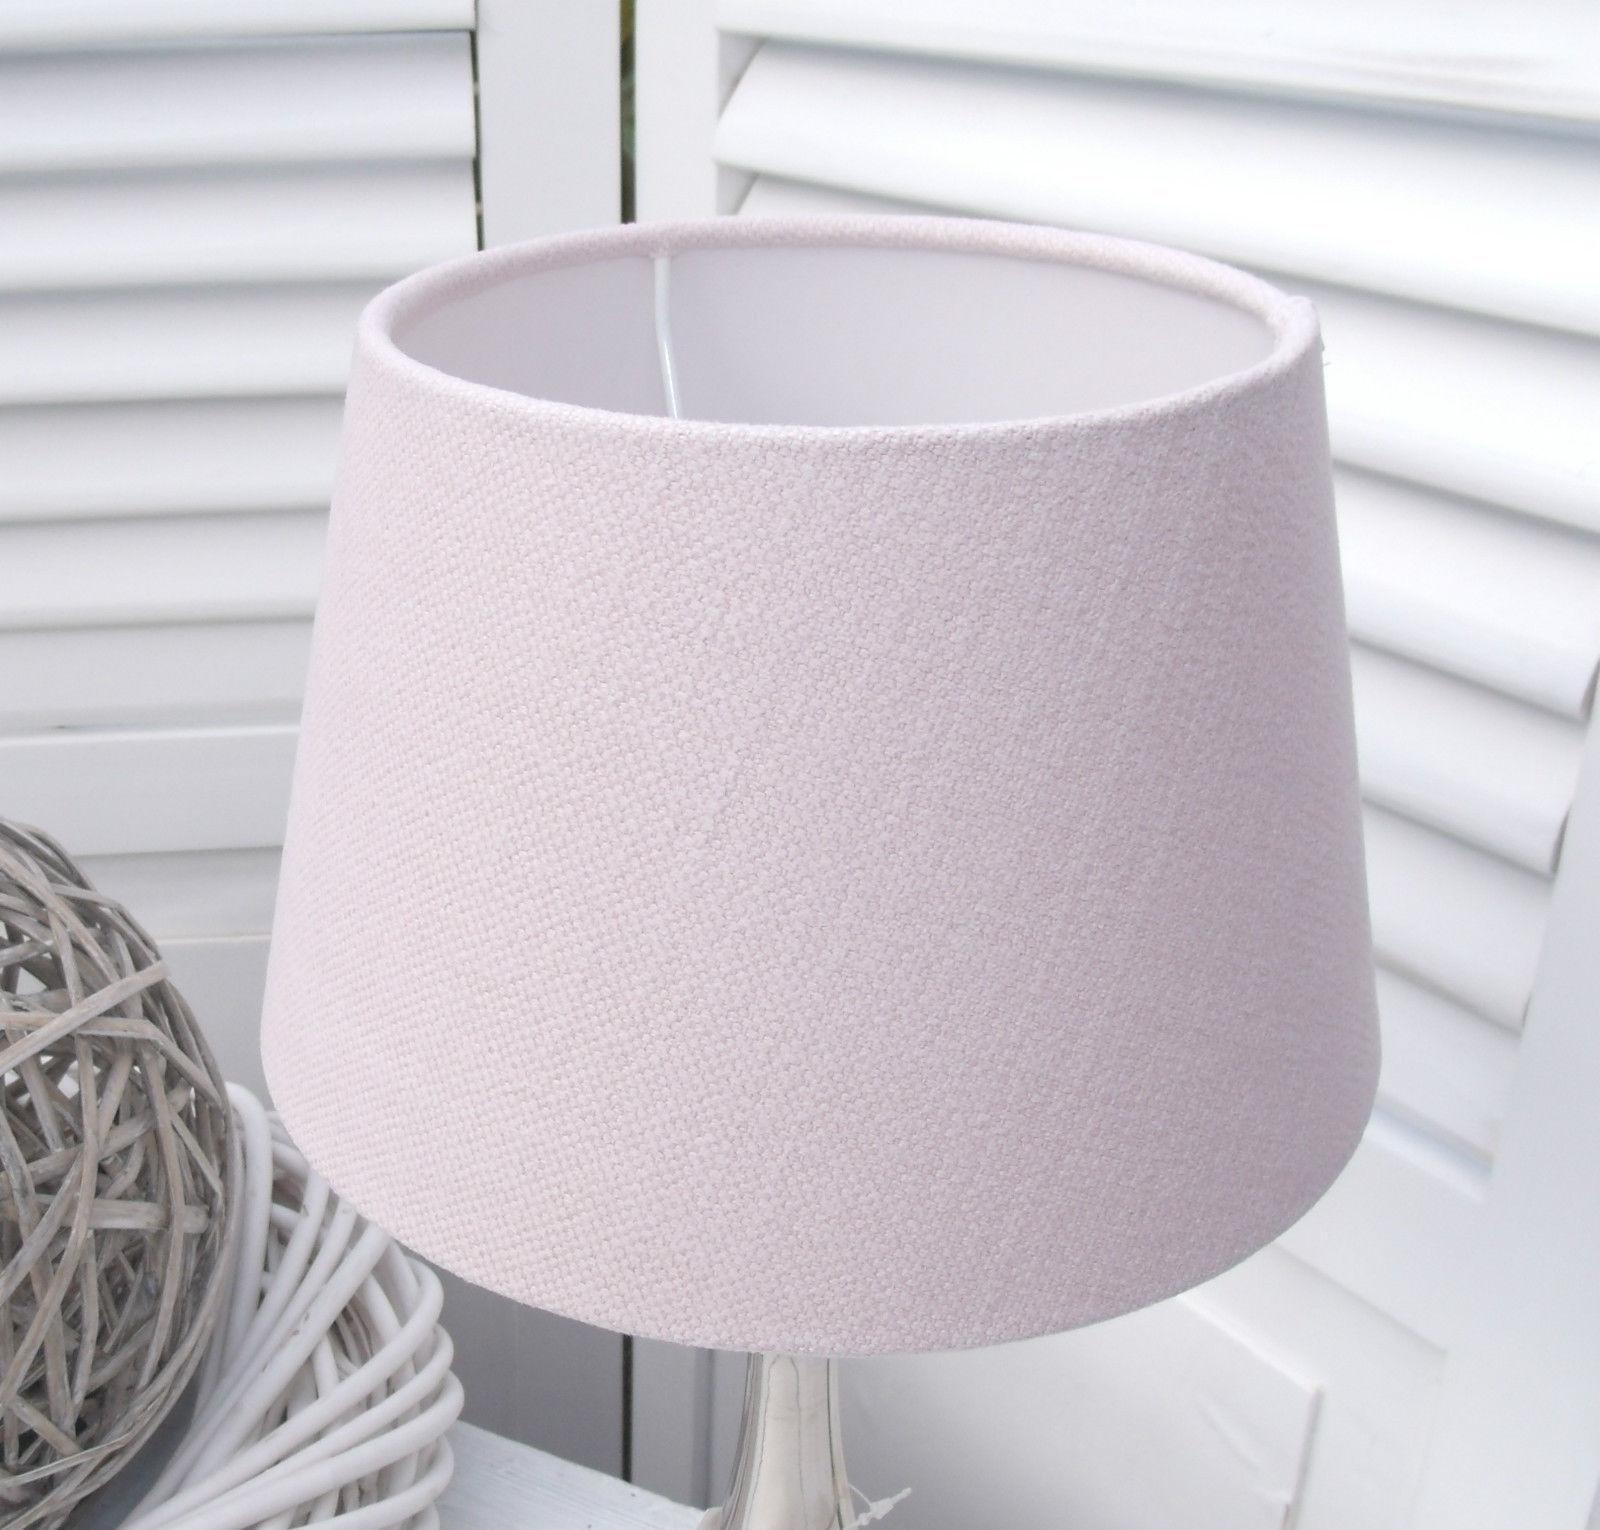 lampenschirm uni rosa 20 15 13 e27 stoff designer. Black Bedroom Furniture Sets. Home Design Ideas